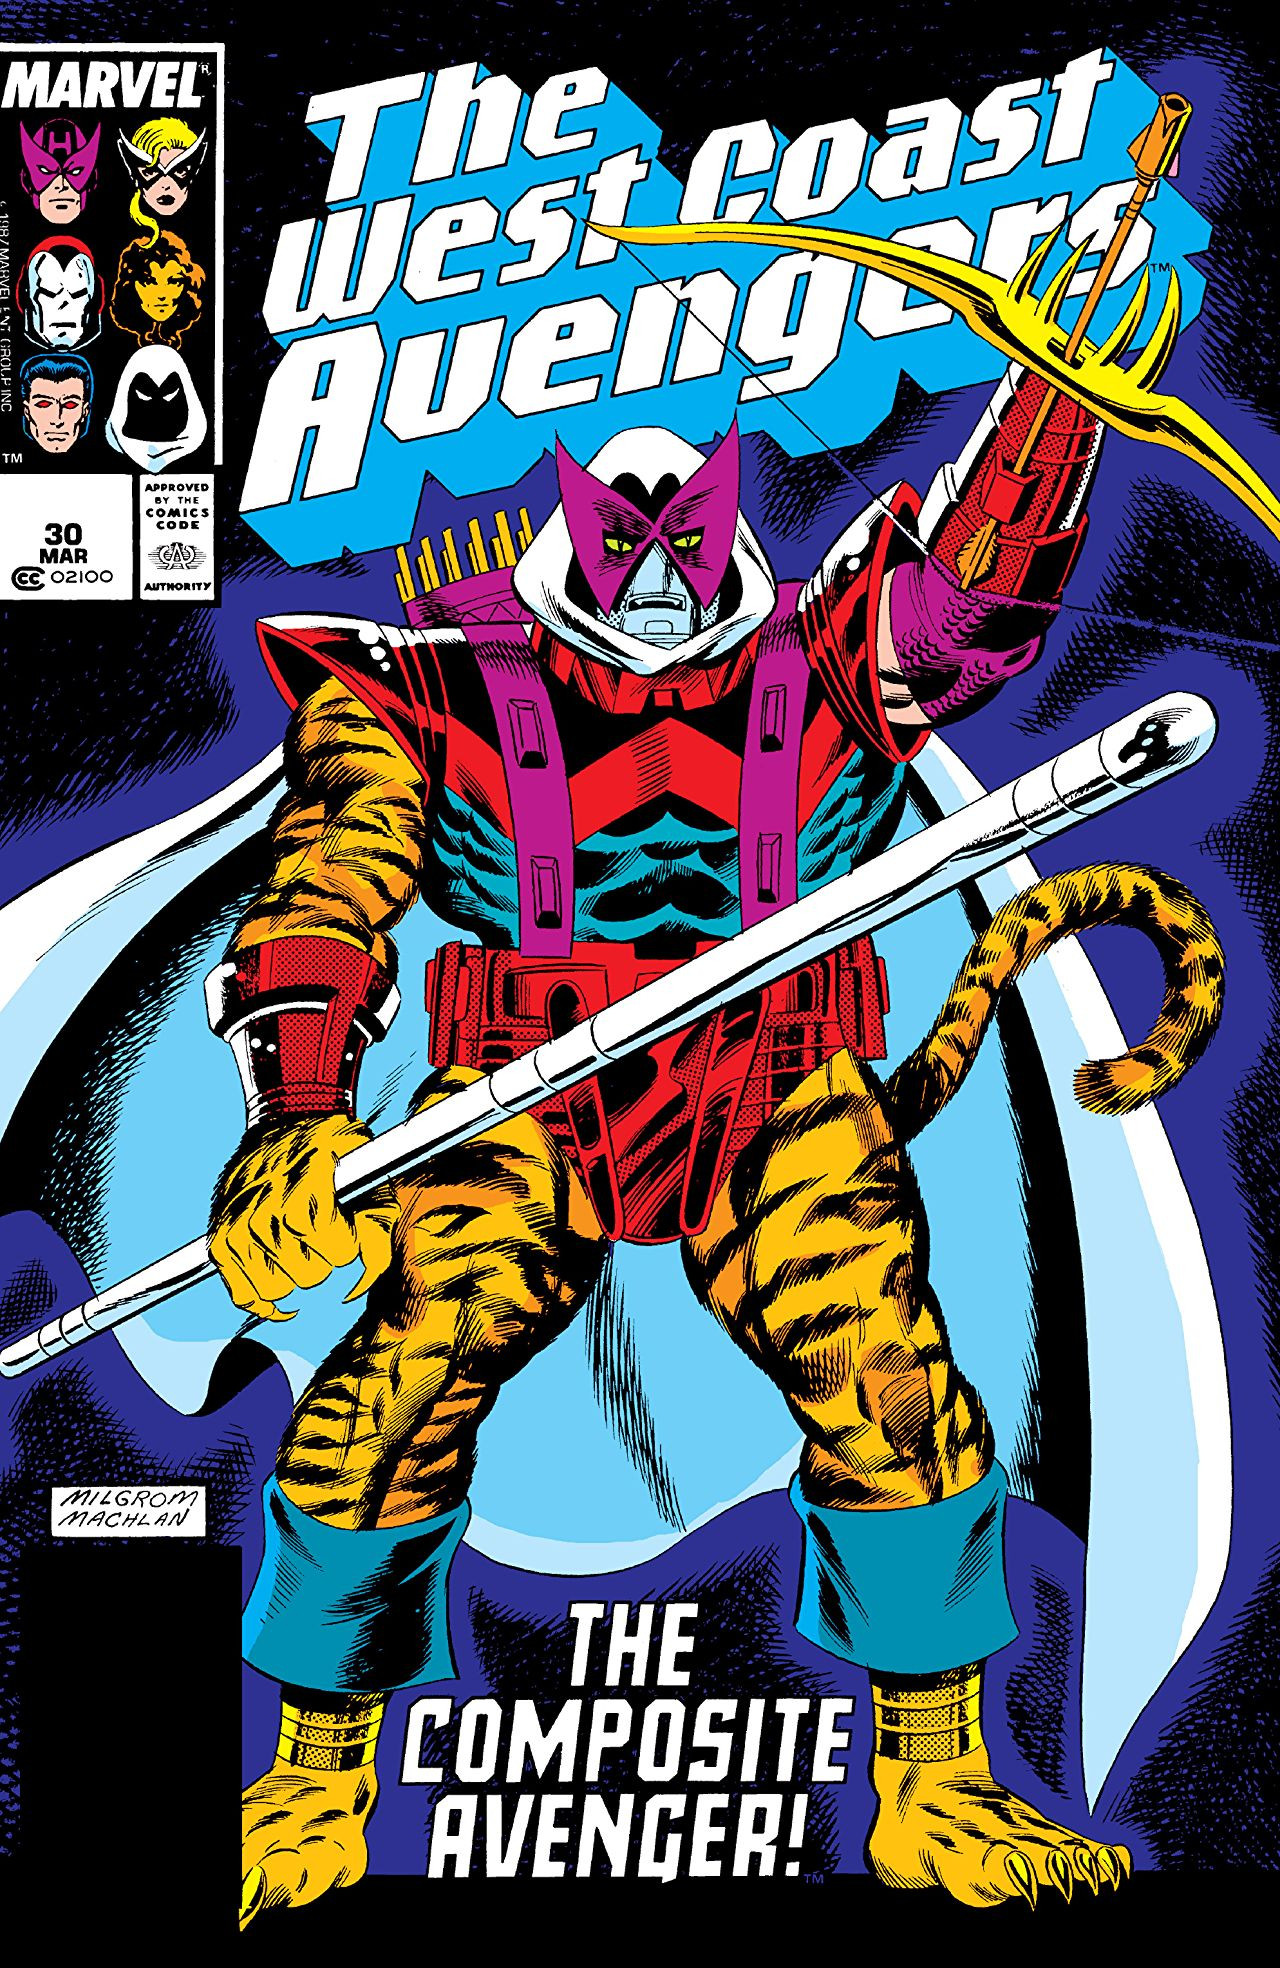 West coast avengers (vol 1) # 53 mint (nm) marvel comics modern age